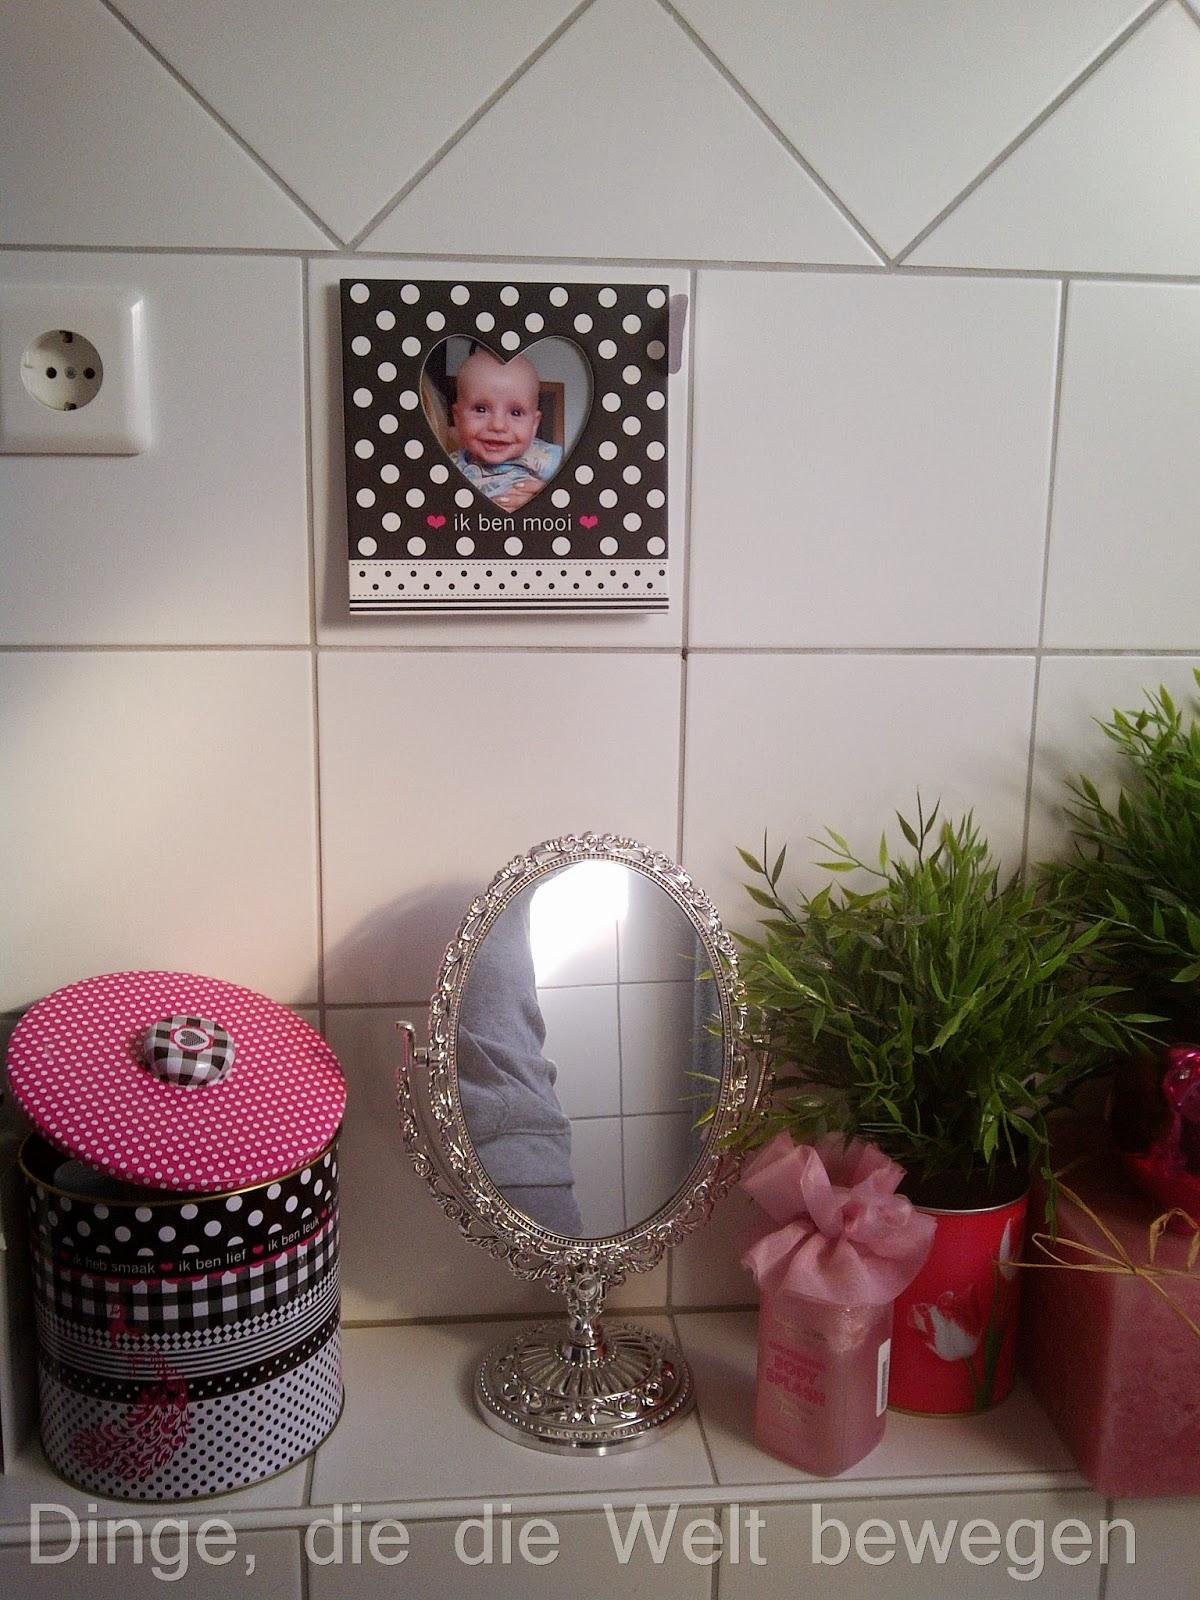 xenos badezimmer - badezimmer 2016, Badezimmer ideen